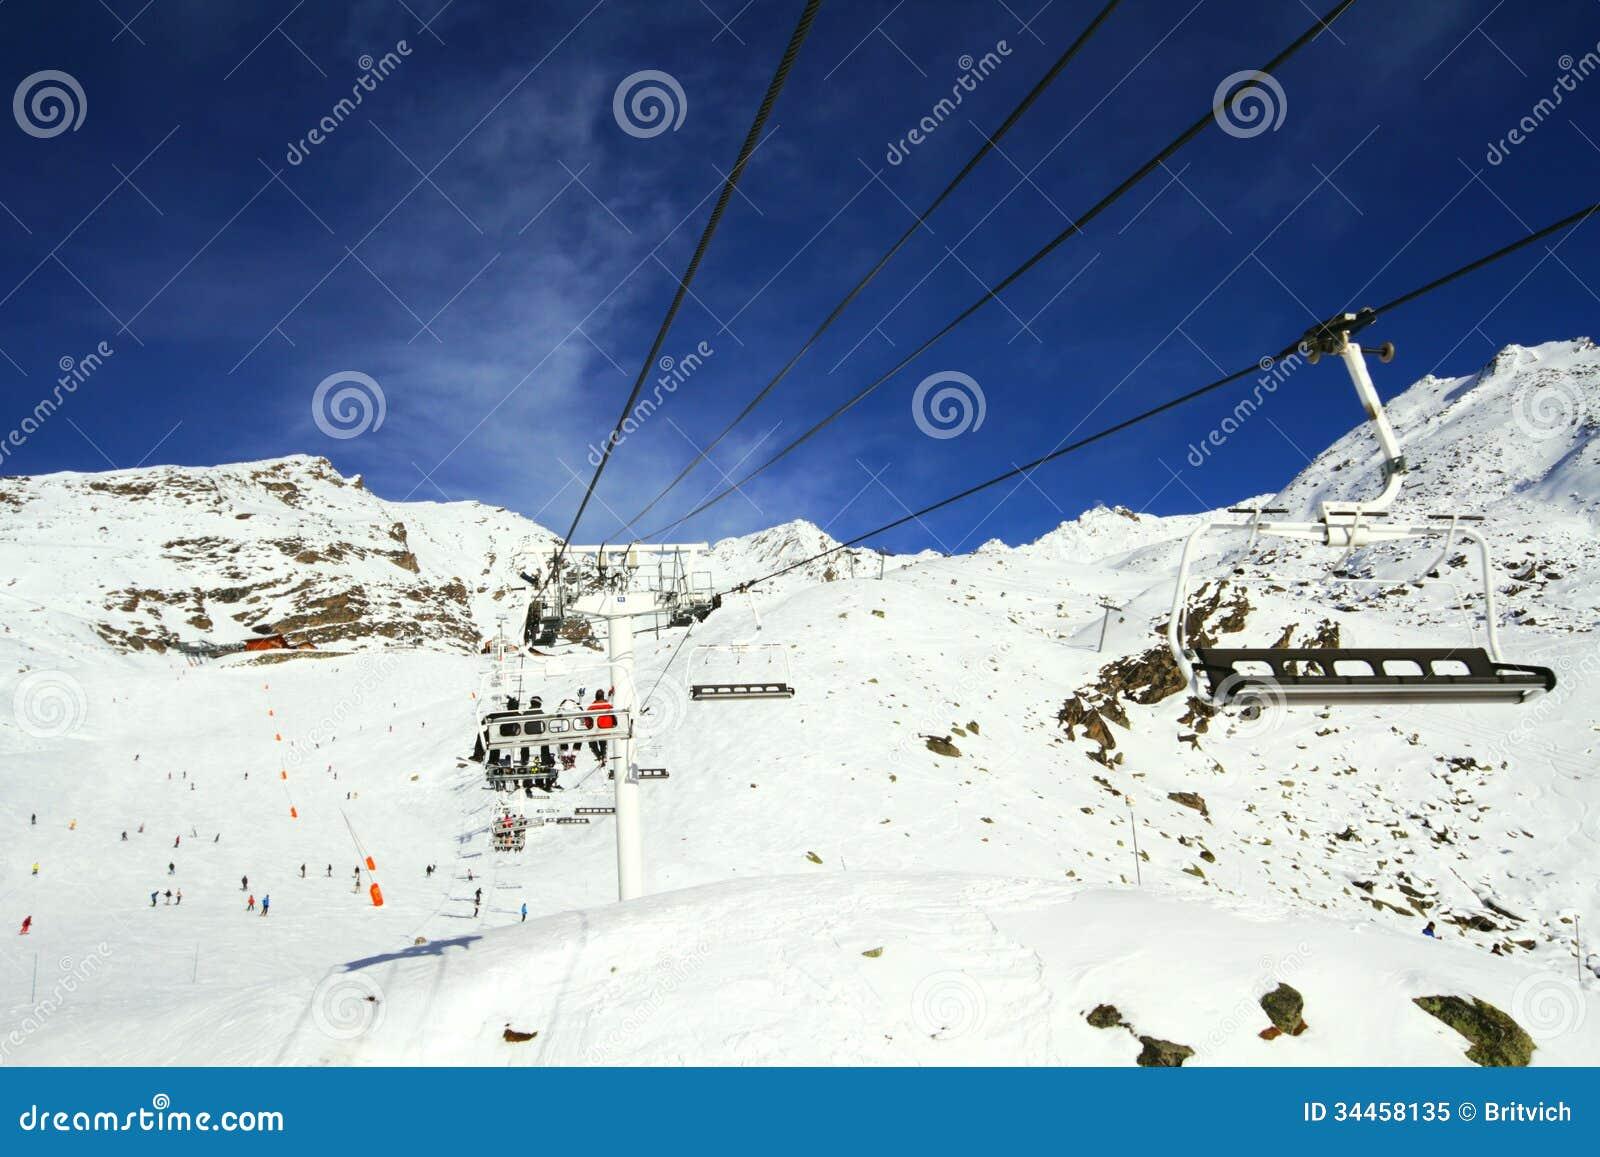 Winter Alpine lift